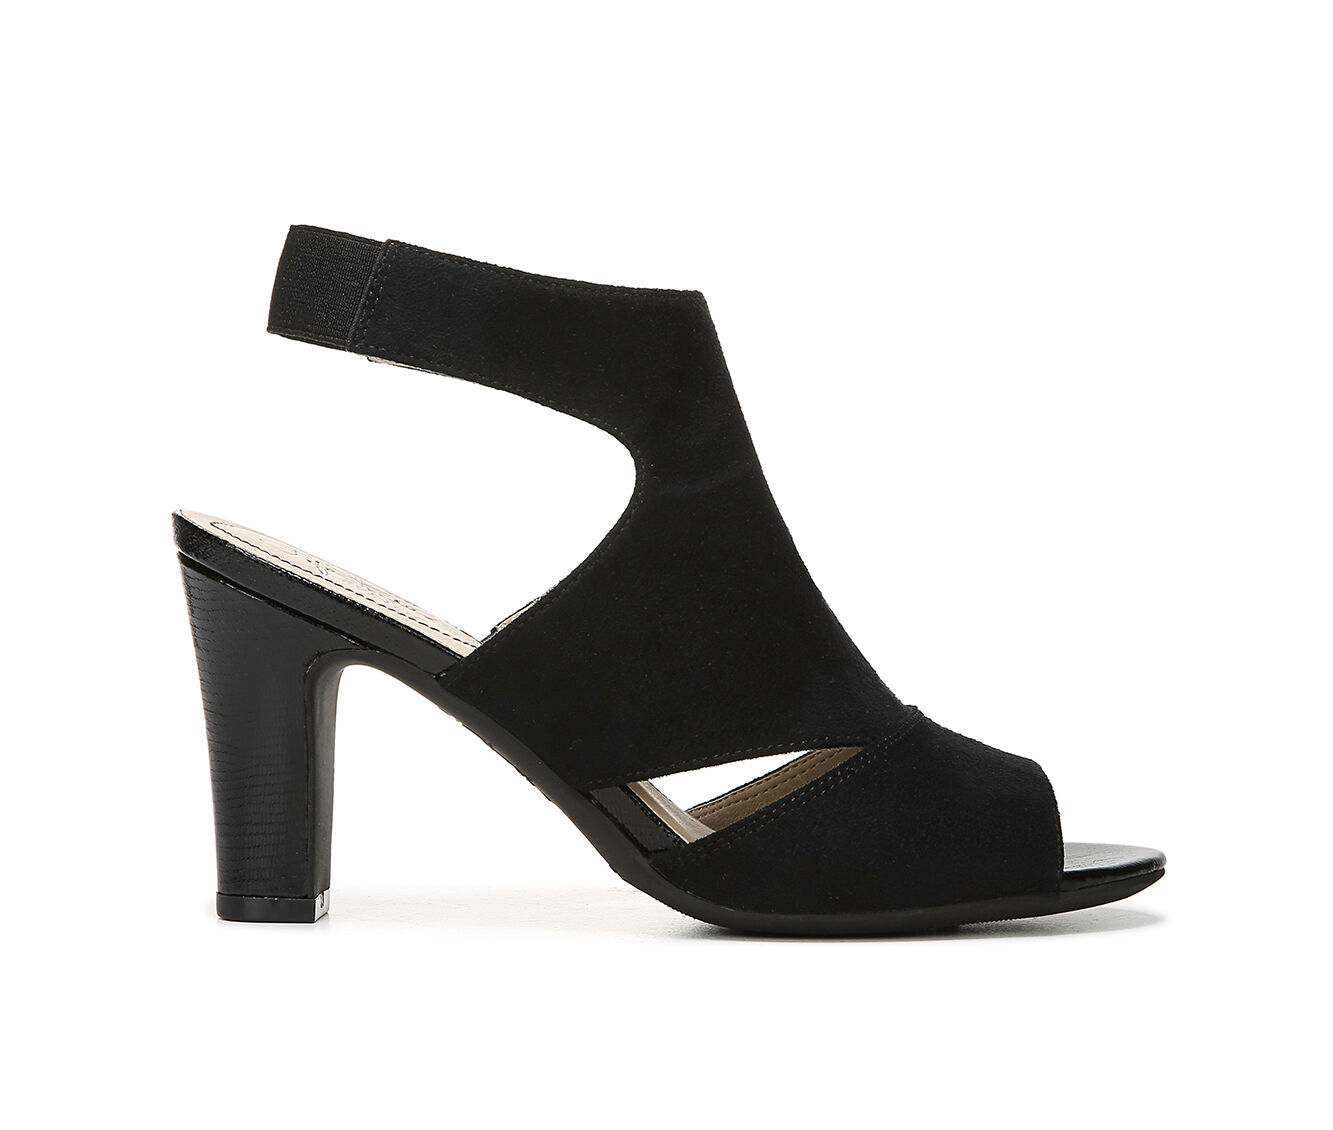 uk shoes_kd3220